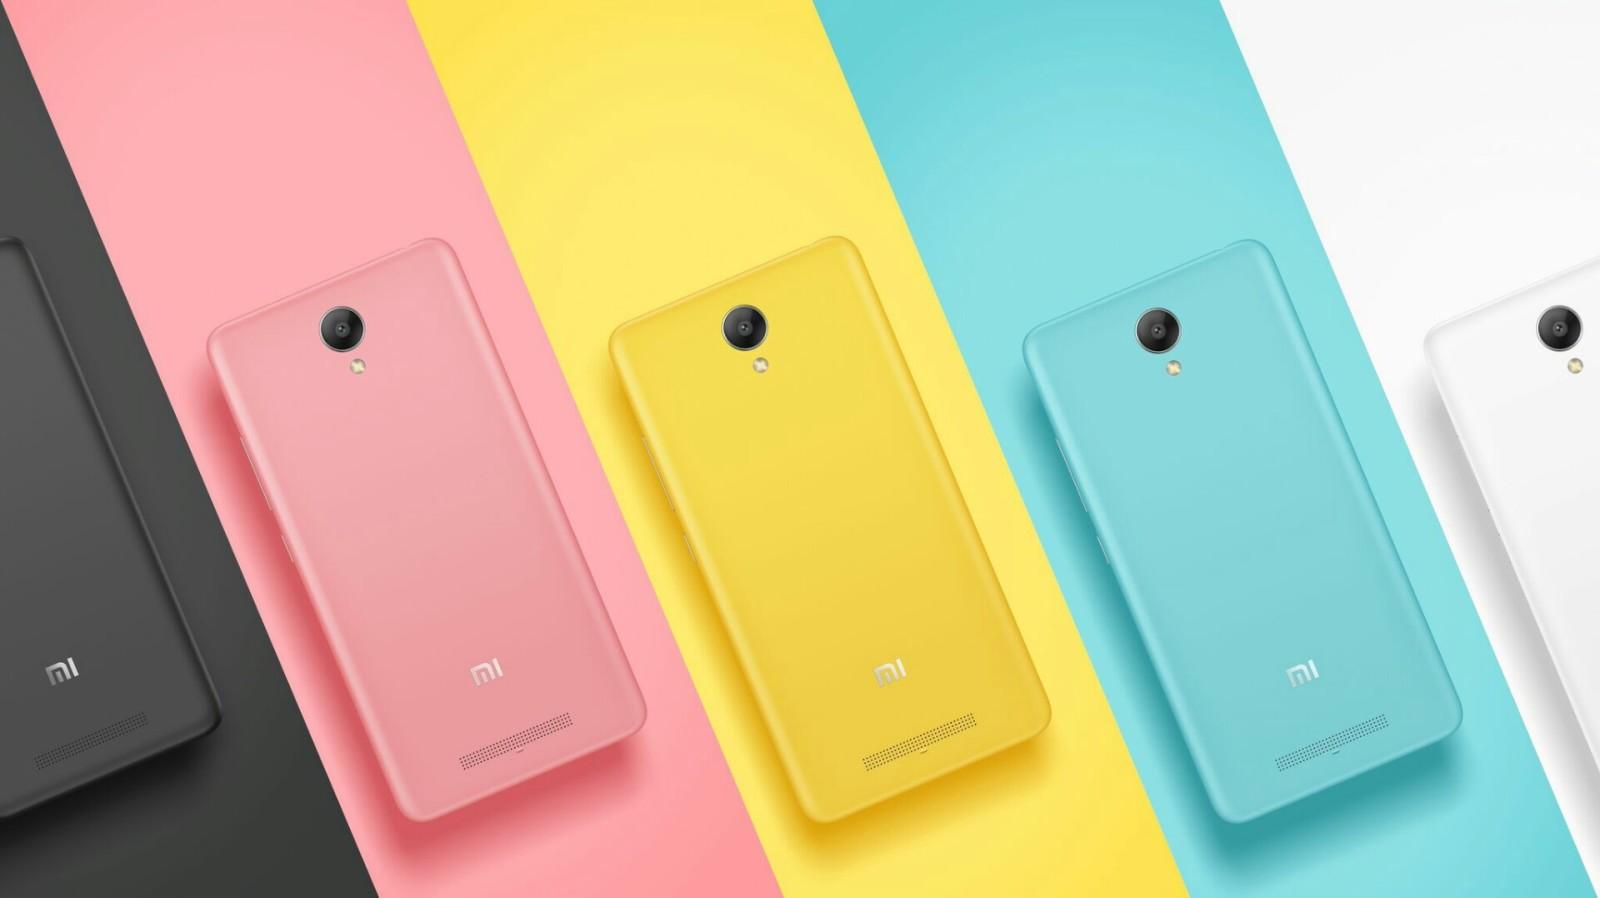 Xiaomi Redmi Note 2 Pro potvrzuje záznam v TENAA